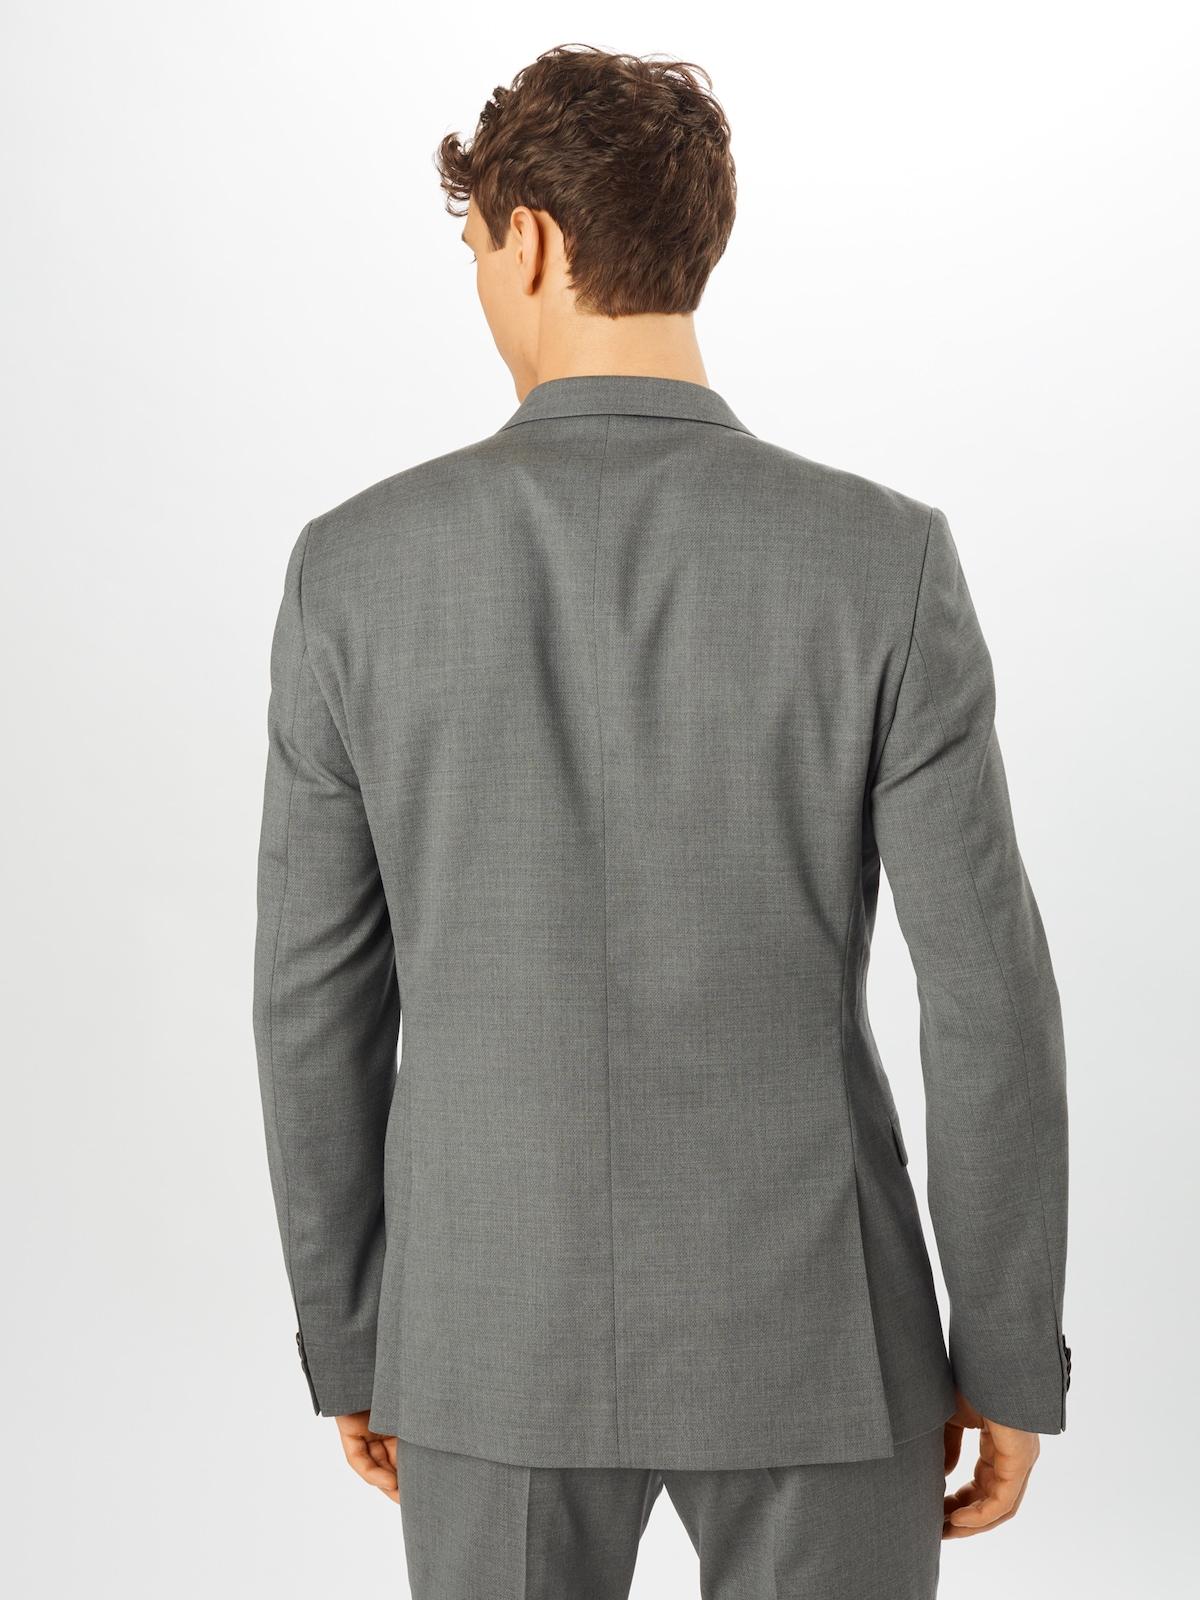 Bestbewertet Männer Bekleidung Tiger of Sweden Anzug 'S.JILE' in graumeliert Verkaufsschlager